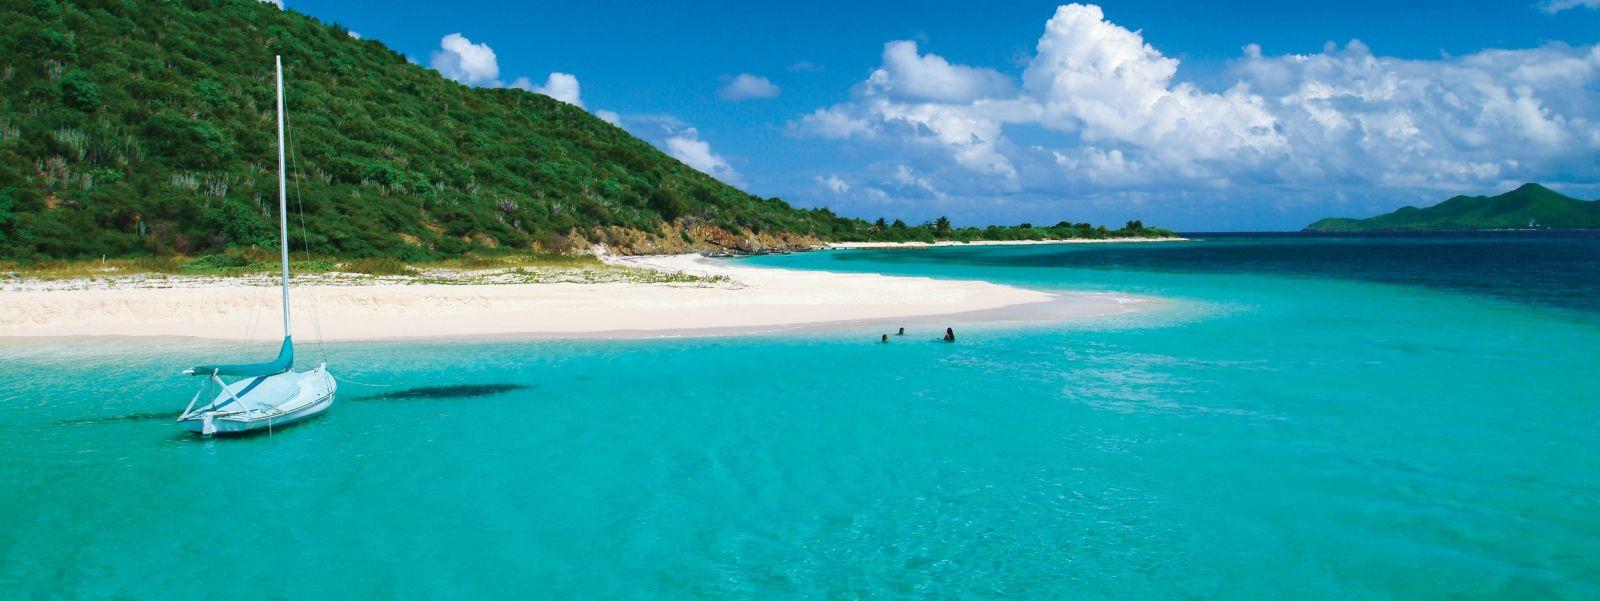 Video on U.S. Virgin Islands